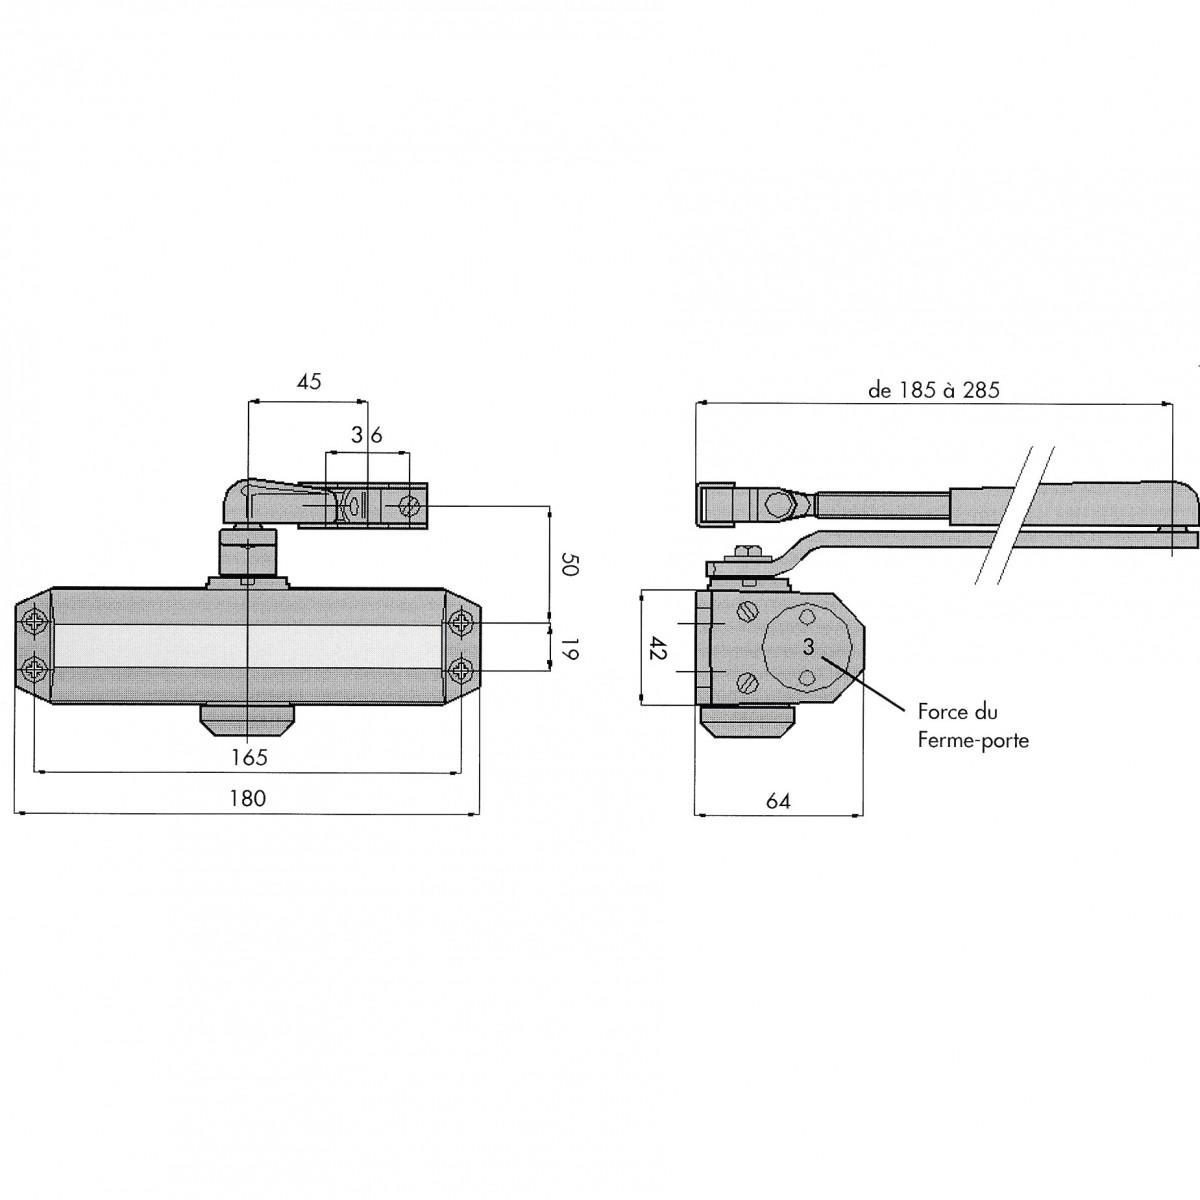 Ferme-porte GR101 force 3 à bras compas - Groom